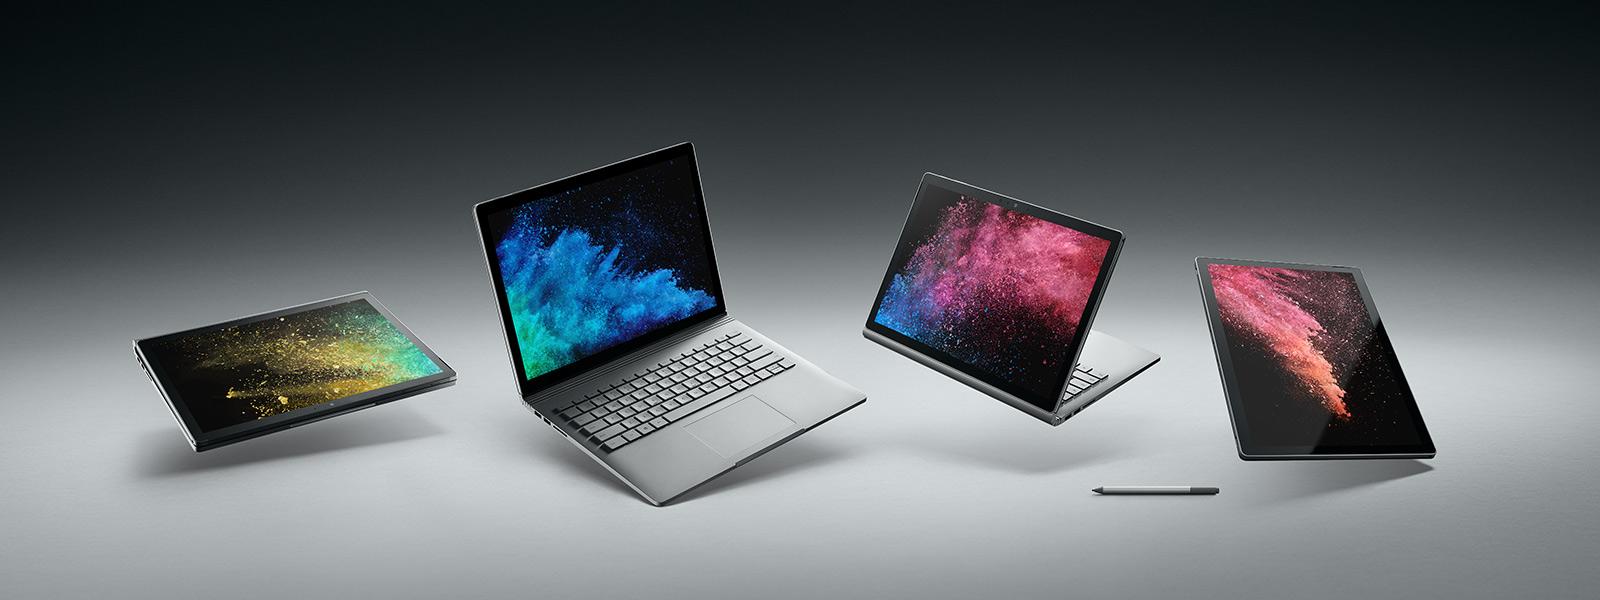 Surface Book 2 แสดงในโหมดต่าง ๆ พร้อมปากกา Surface